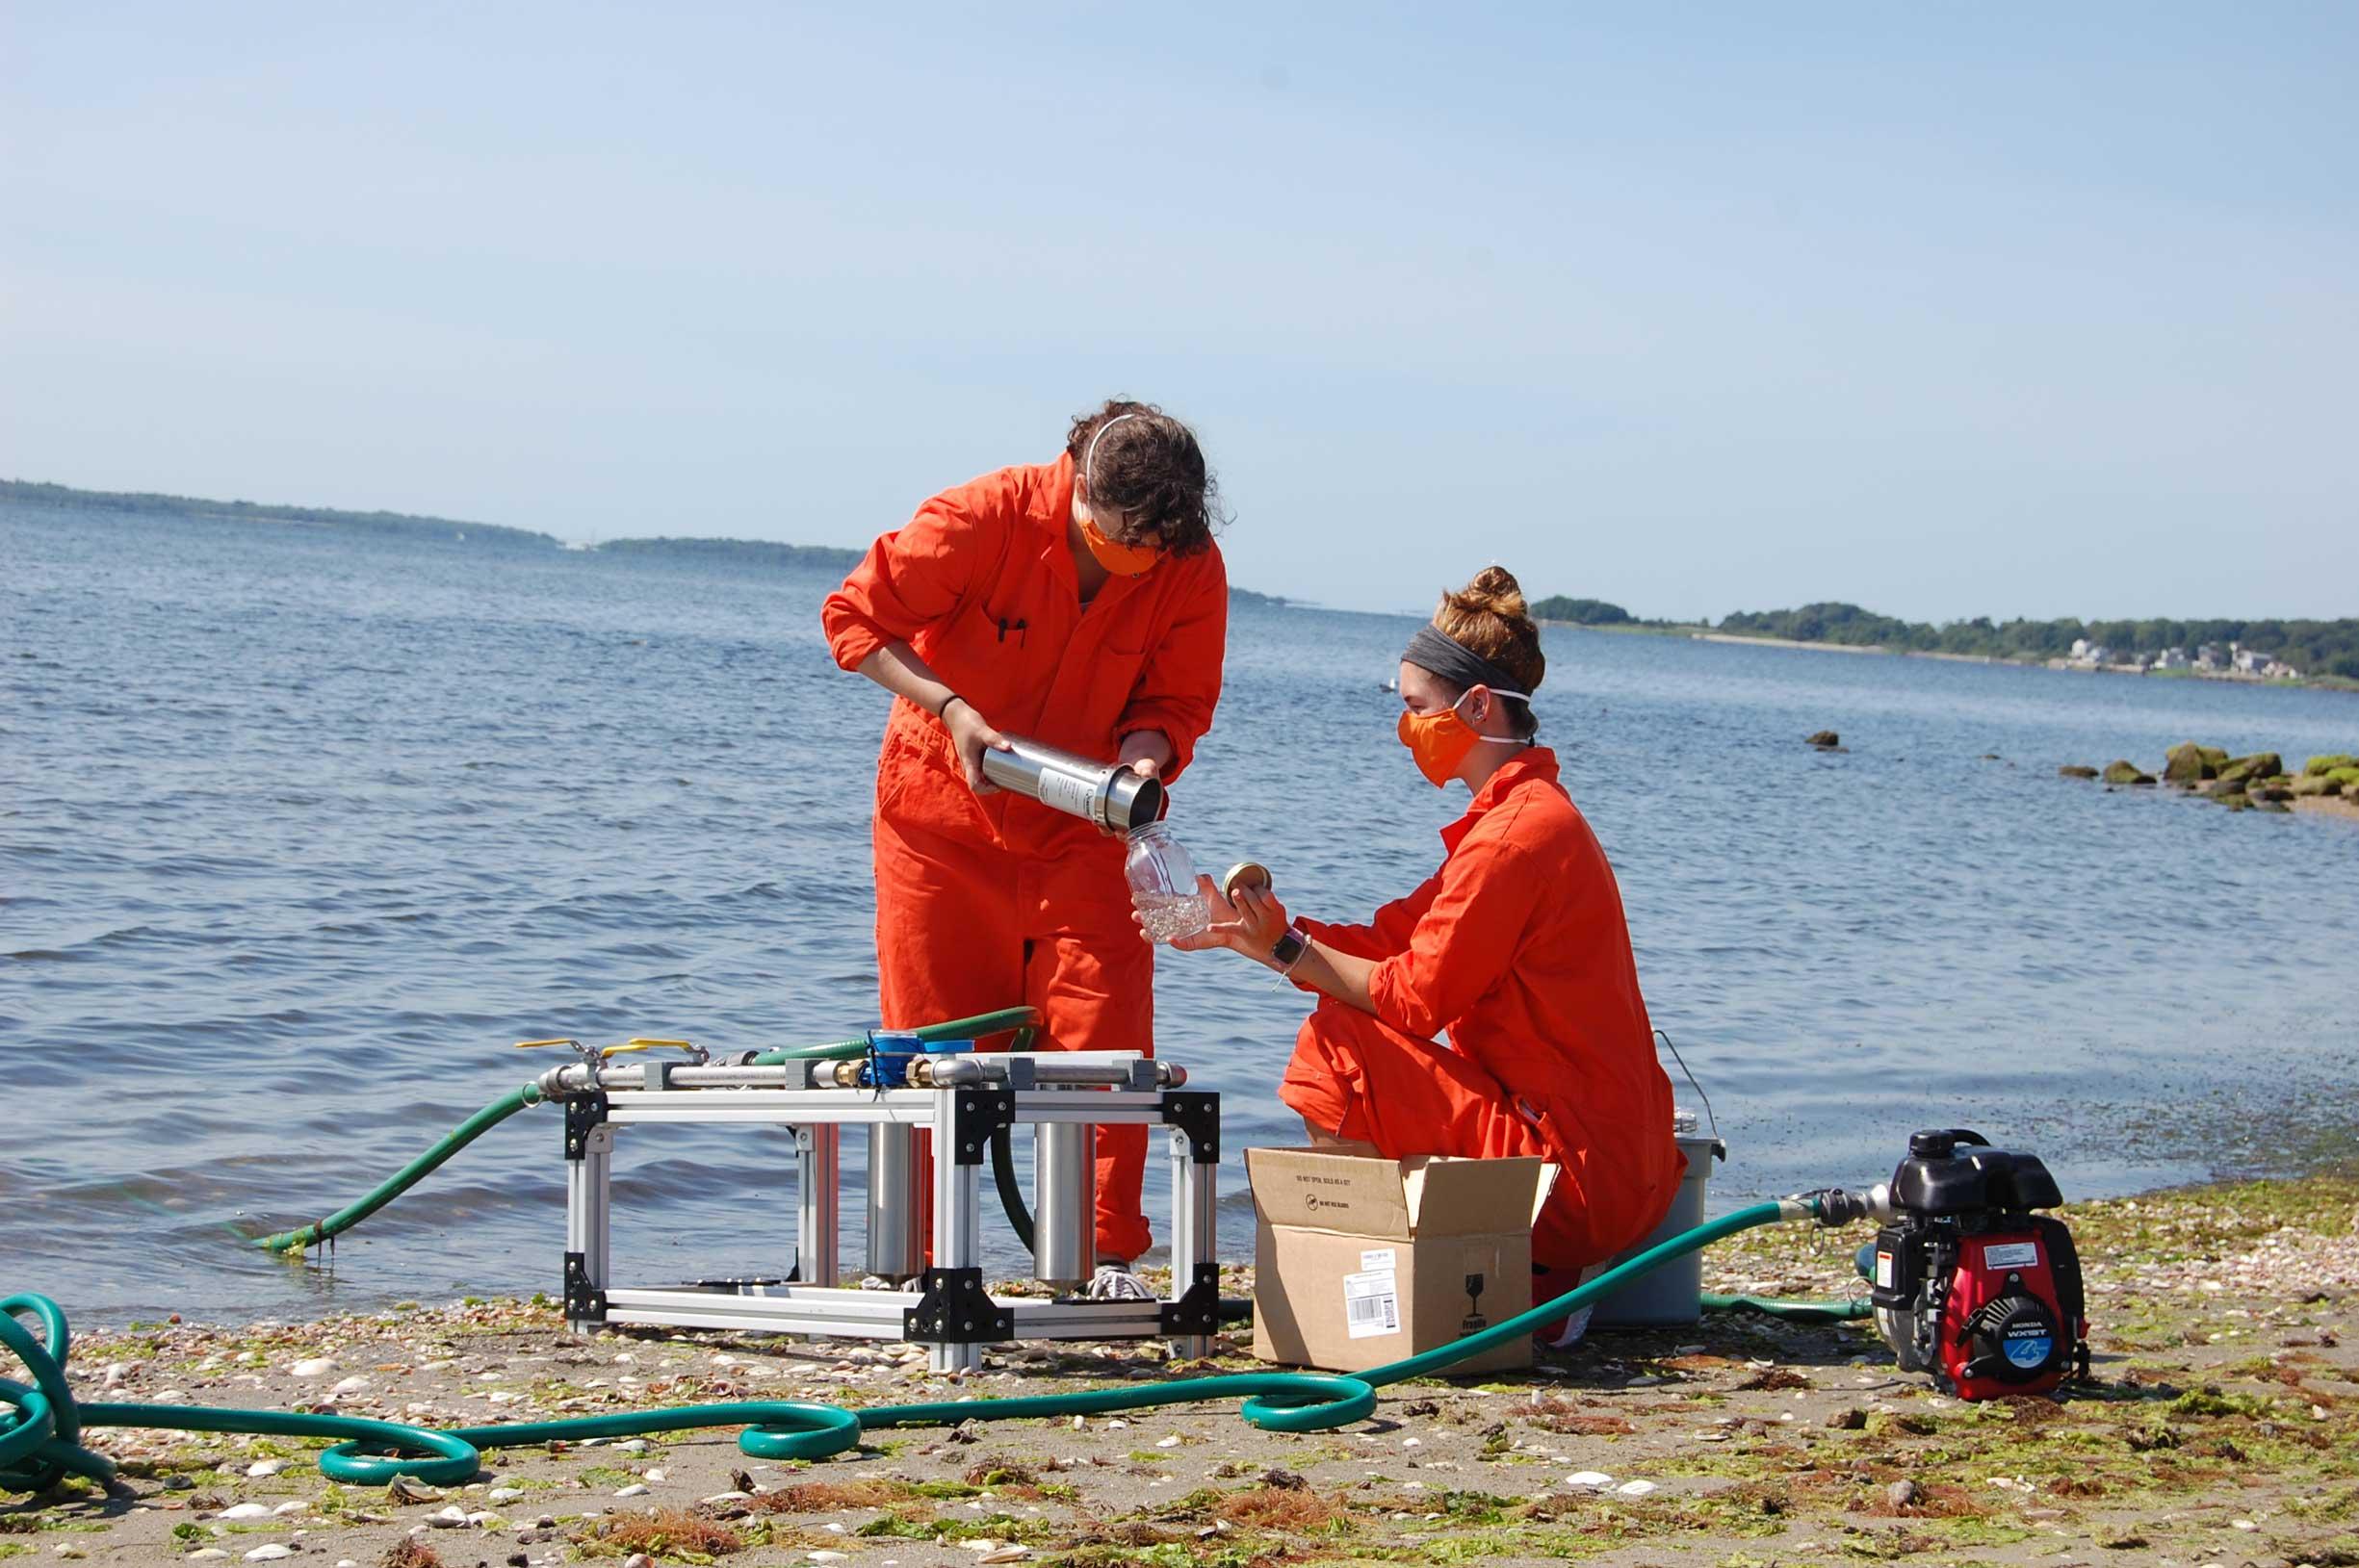 Coastal Fellows measure micro plastics in Narragansett Bay project